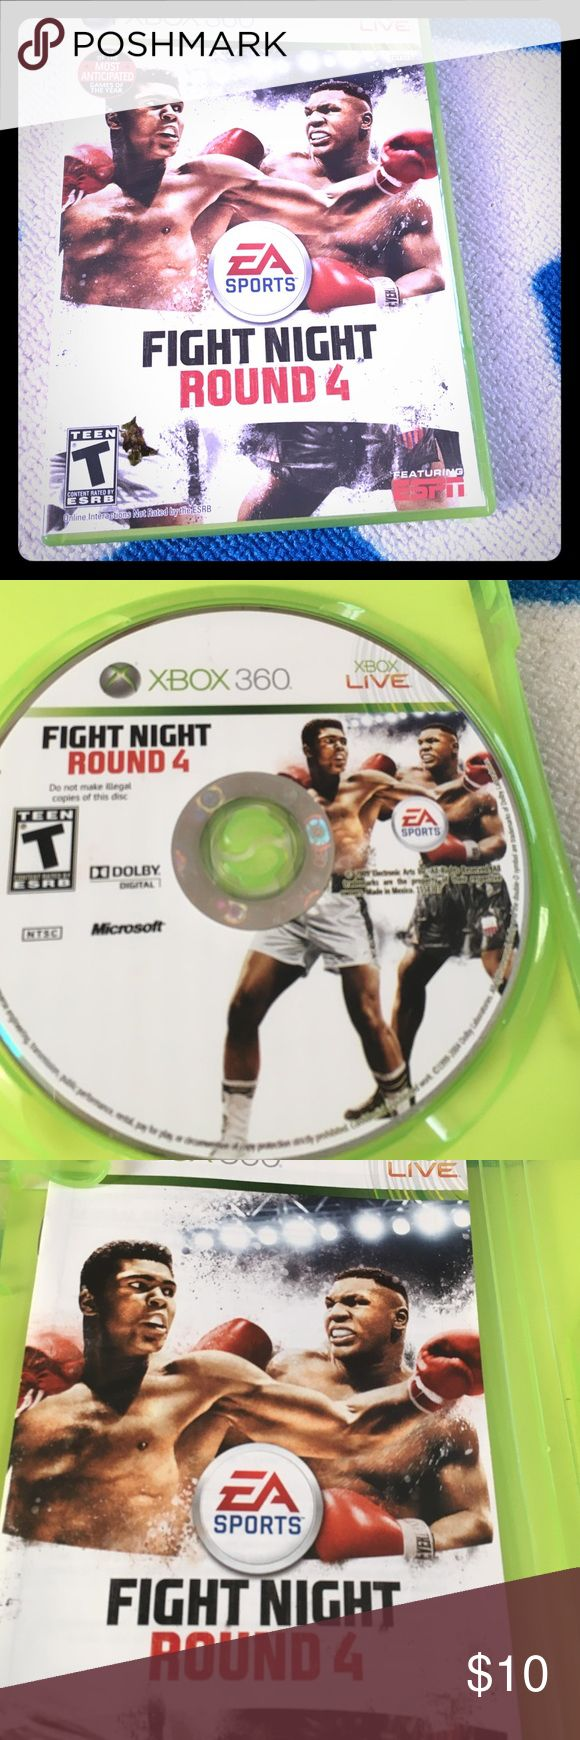 Selling this Fight night round 4 Xbox 360 on Poshmark! My username is: icesis22. #shopmycloset #poshmark #fashion #shopping #style #forsale #Xbox 360 #Other